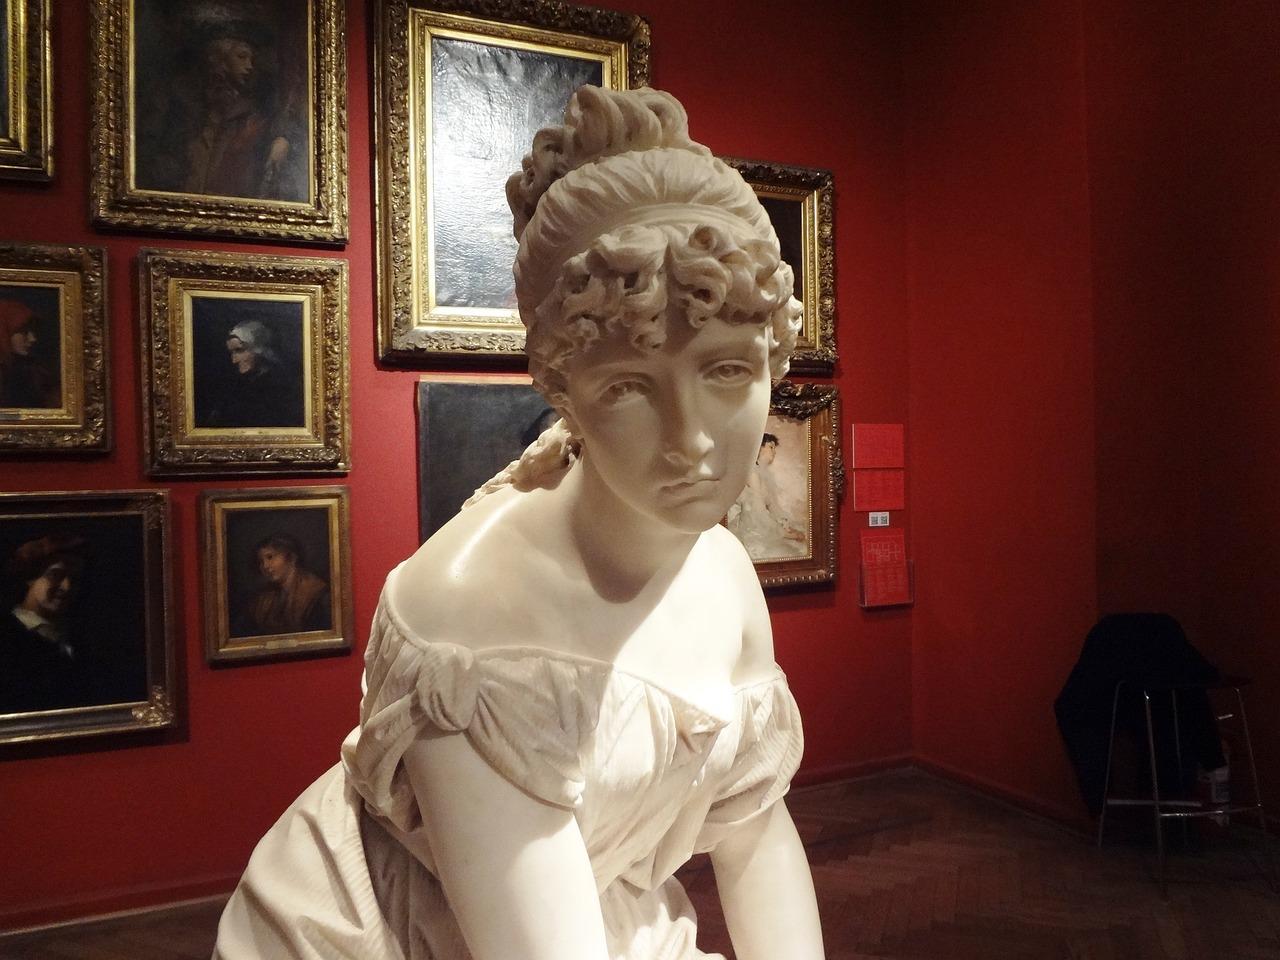 Скульптура в музее картинки